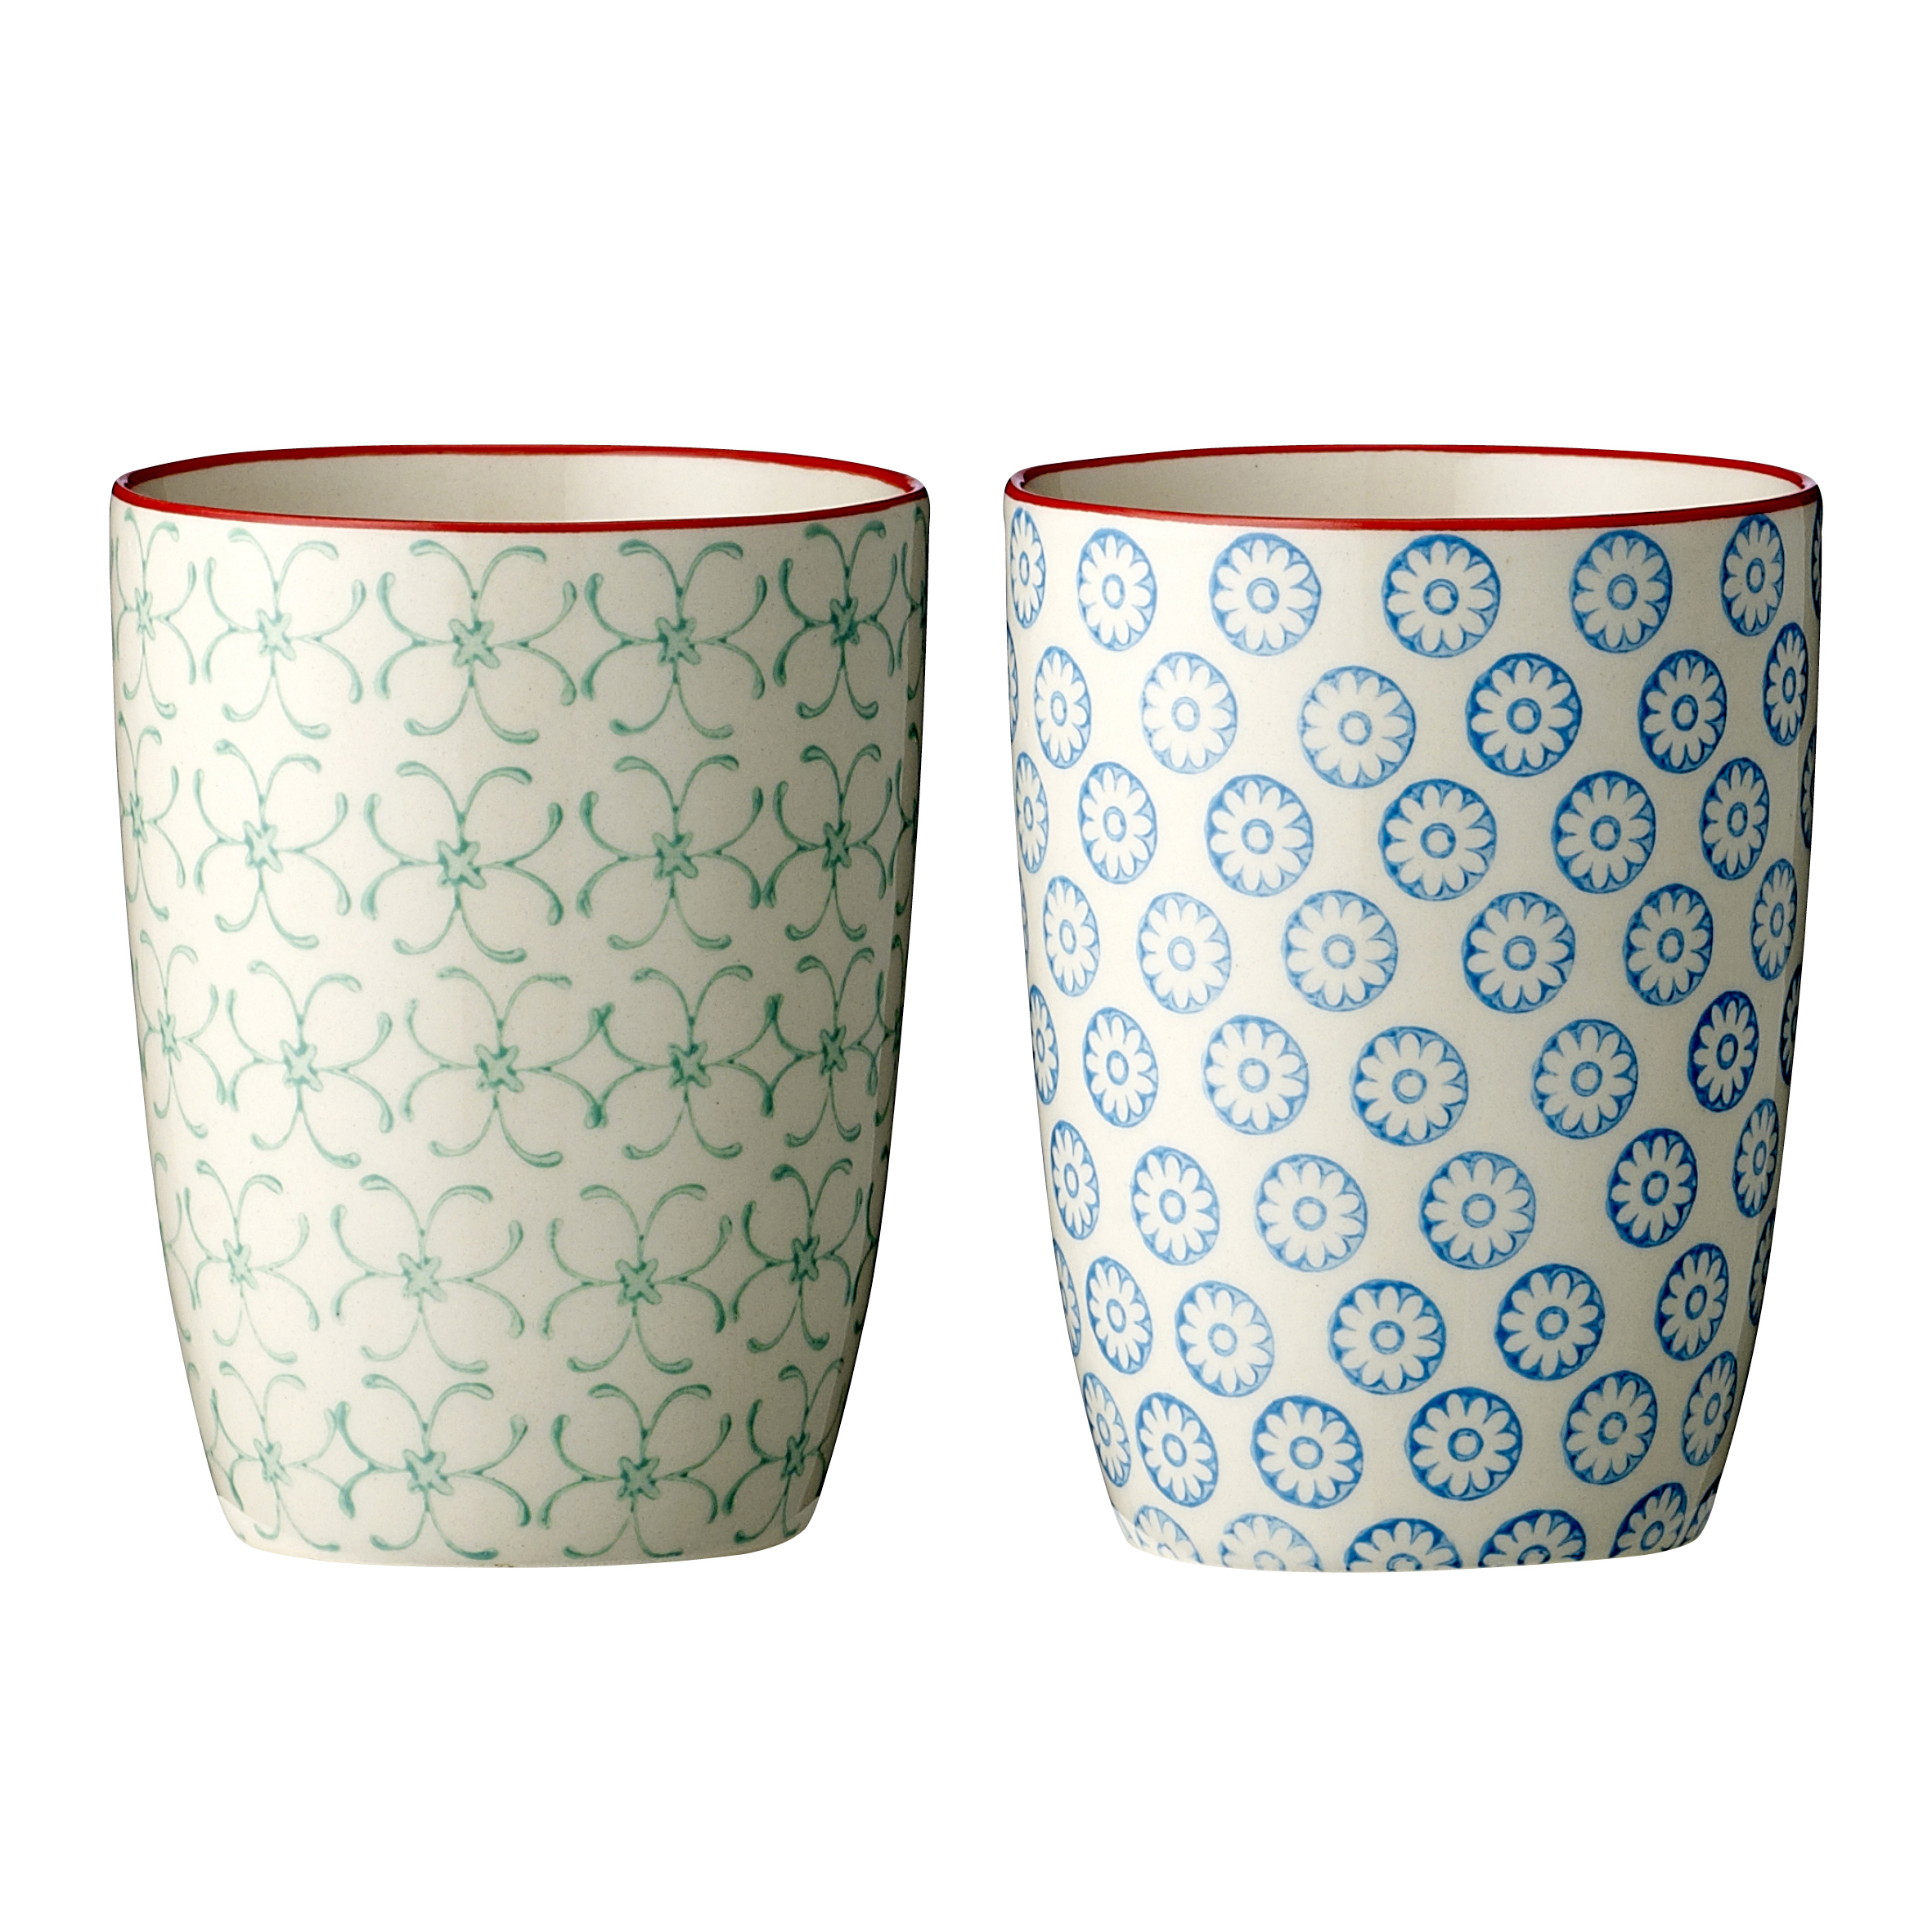 bloomingville emma becher tasse kaffeebecher handbemalt porzellan blau gr n ebay. Black Bedroom Furniture Sets. Home Design Ideas